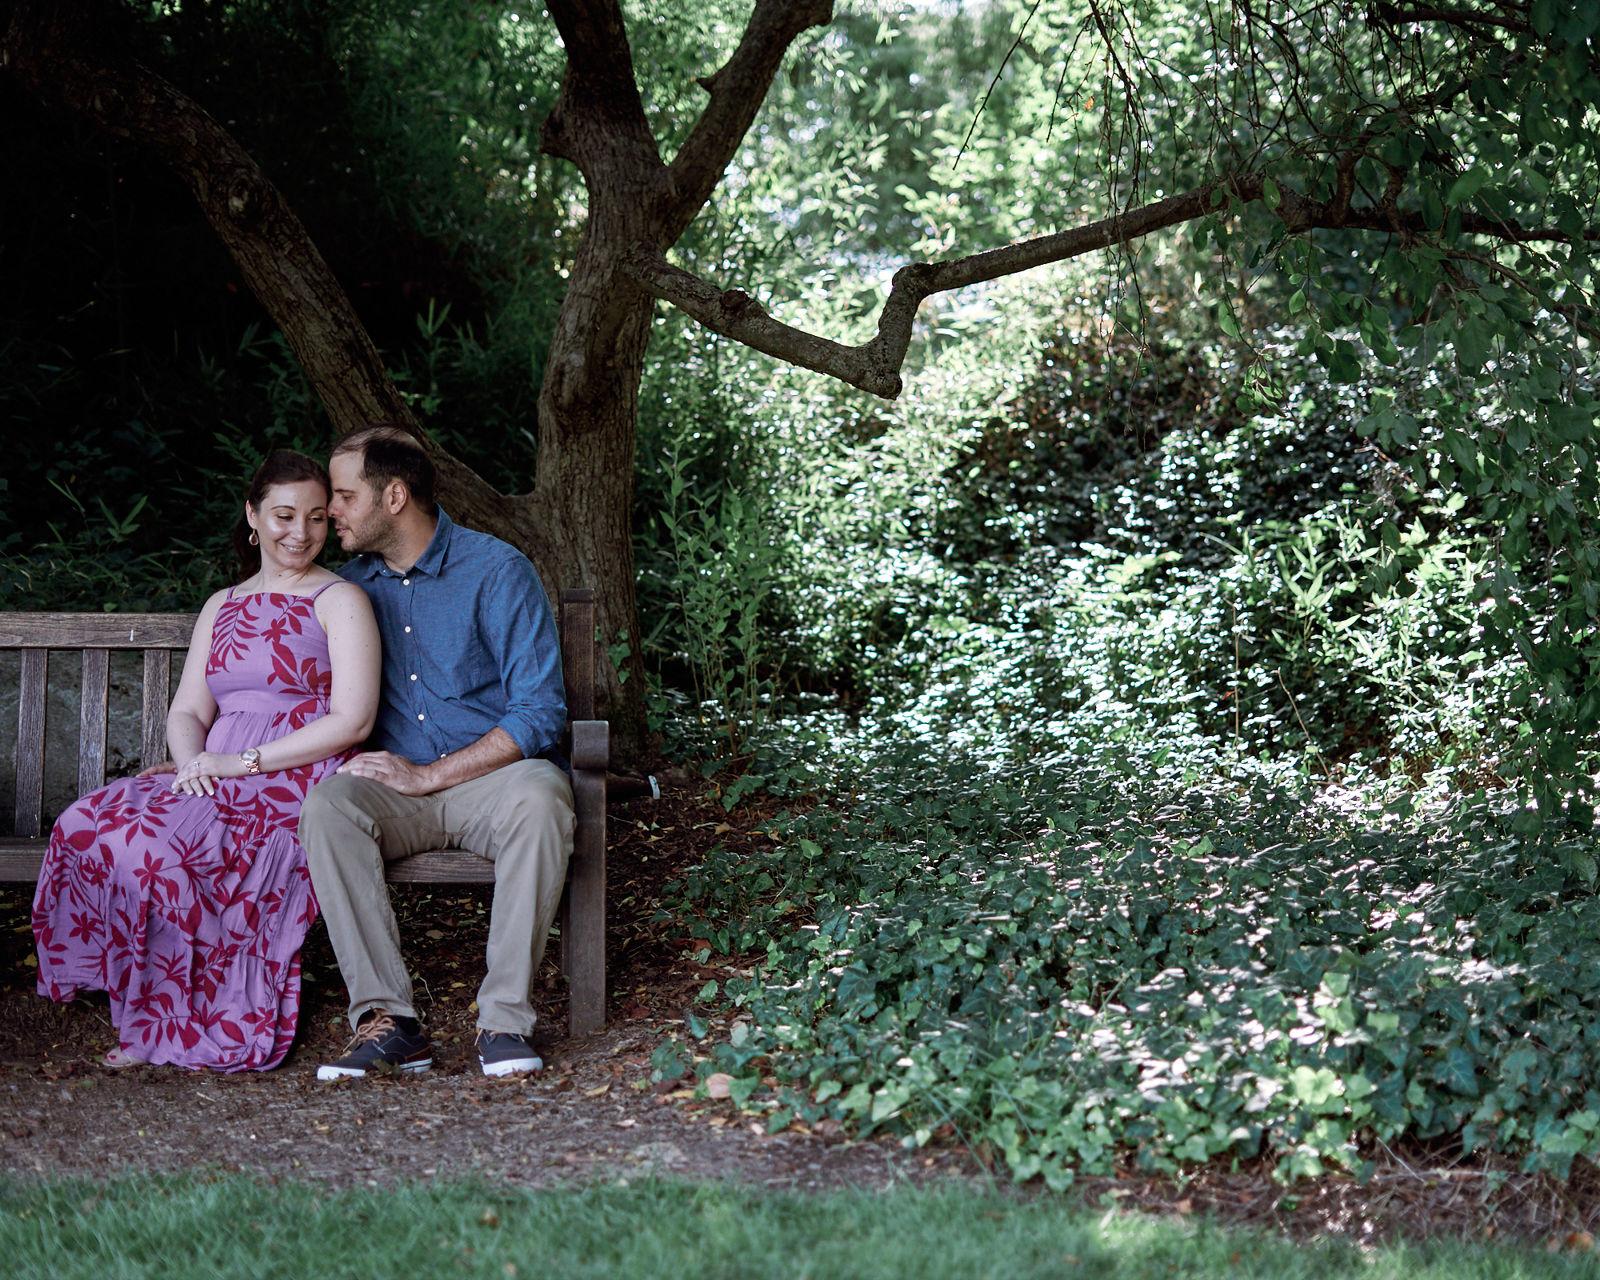 Sam & Maria Engagement Photos, Hershey Gardens, Pennsylvania